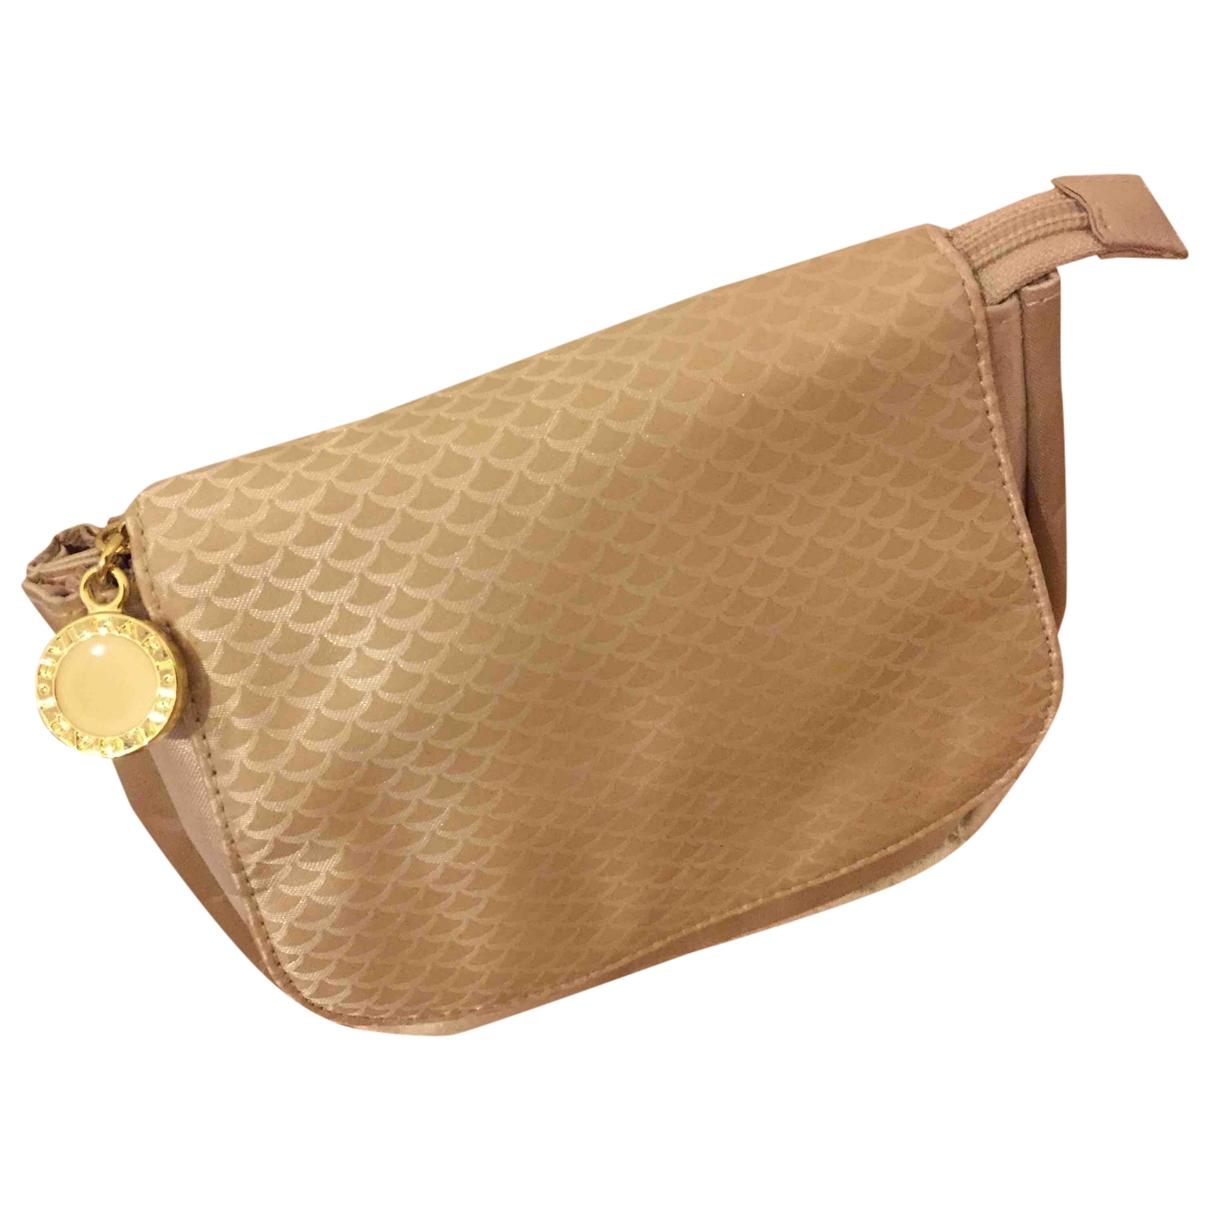 Bvlgari \N Beige Cloth handbag for Women \N